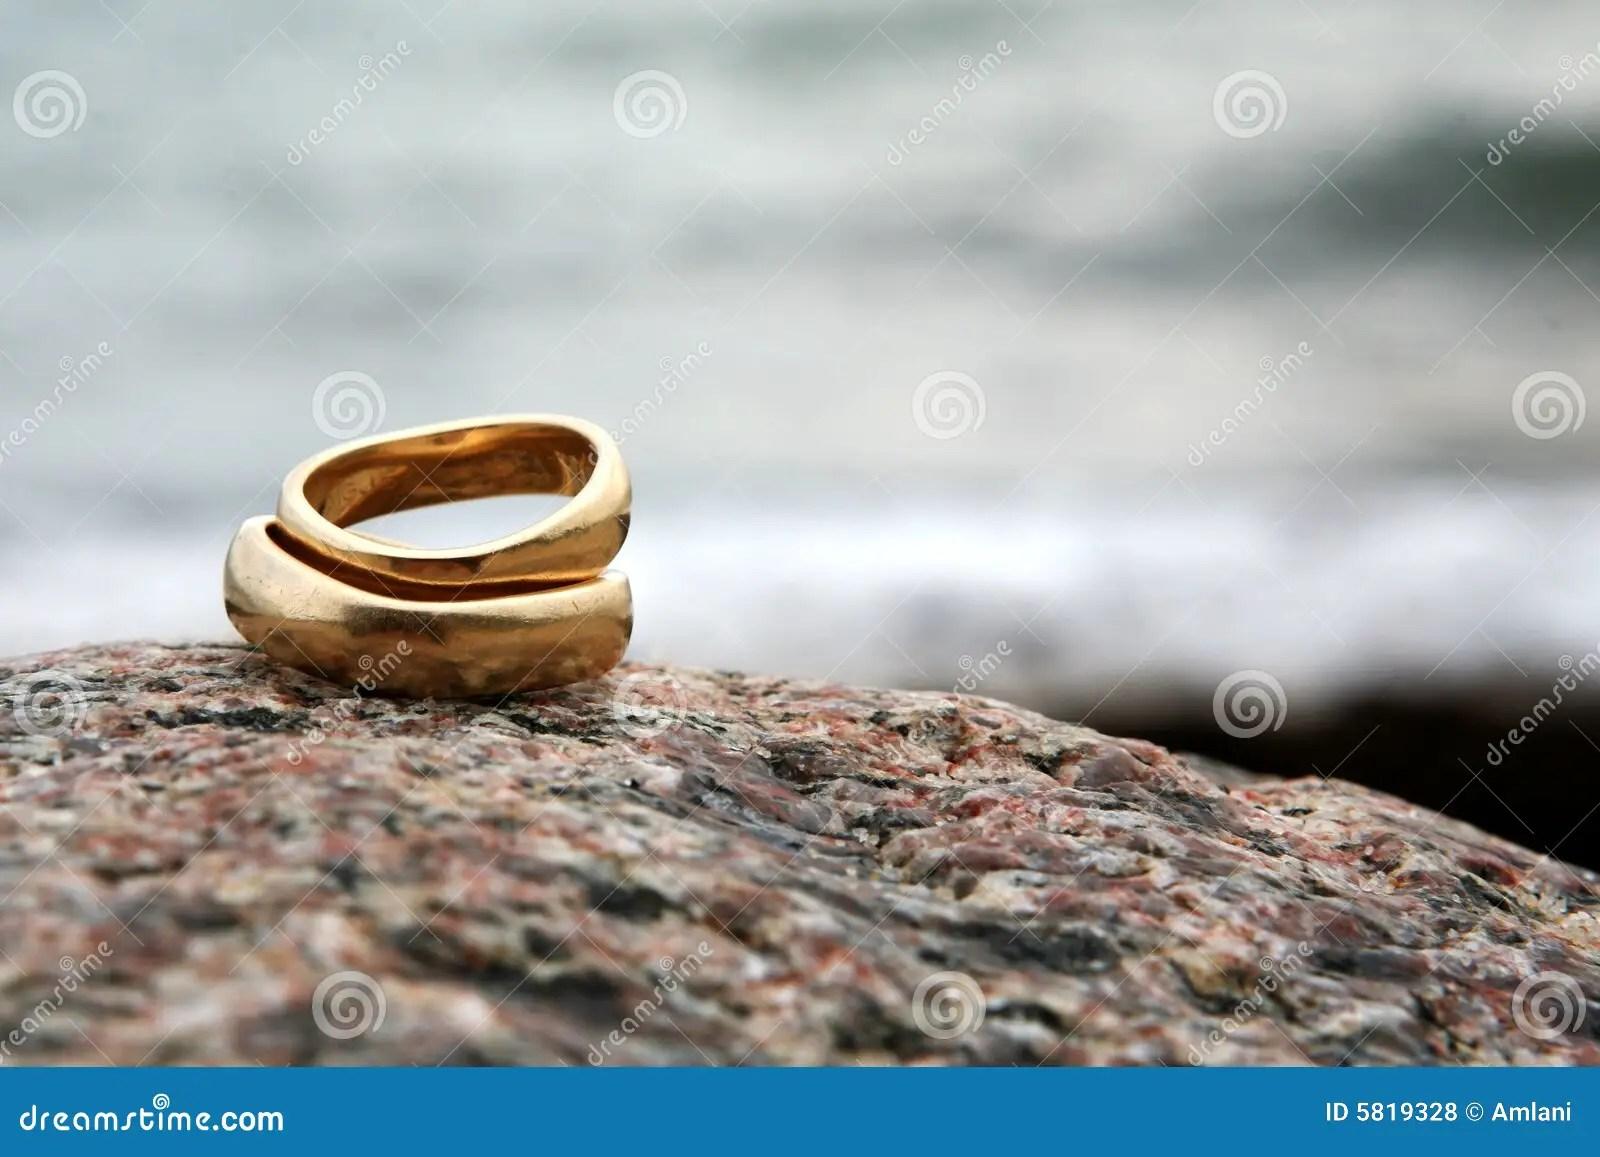 Wedding Rings Royalty Free Stock Photos Image 5819328